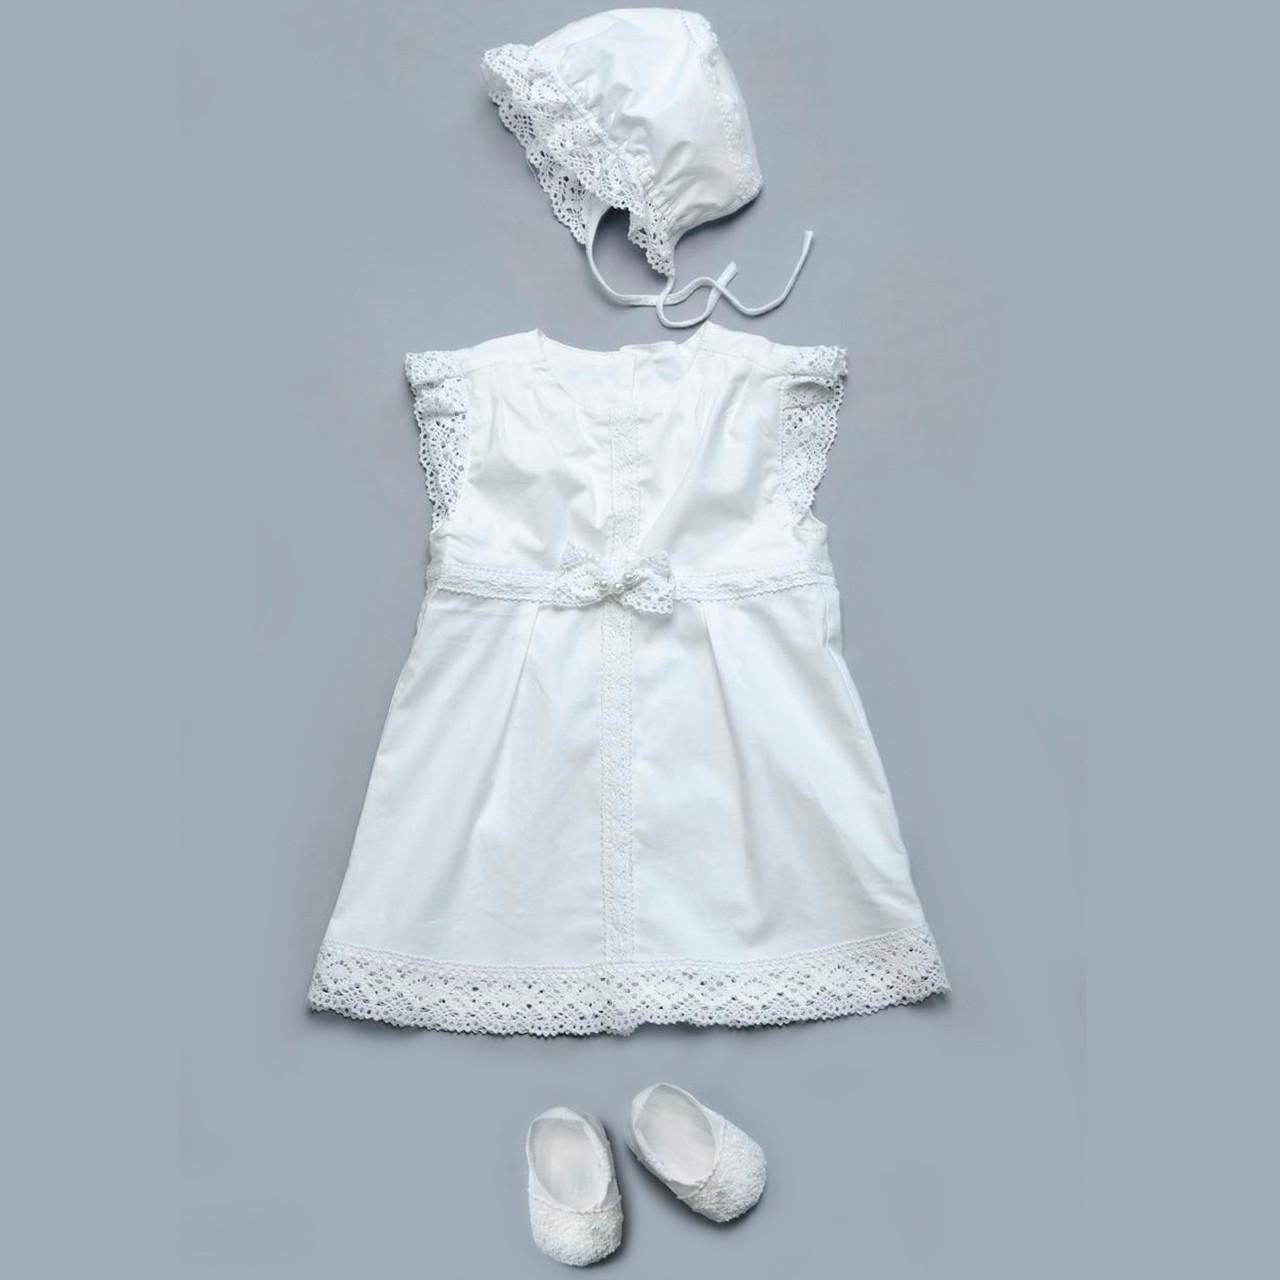 Комплект для крестин Модный карапуз  62 см Белый